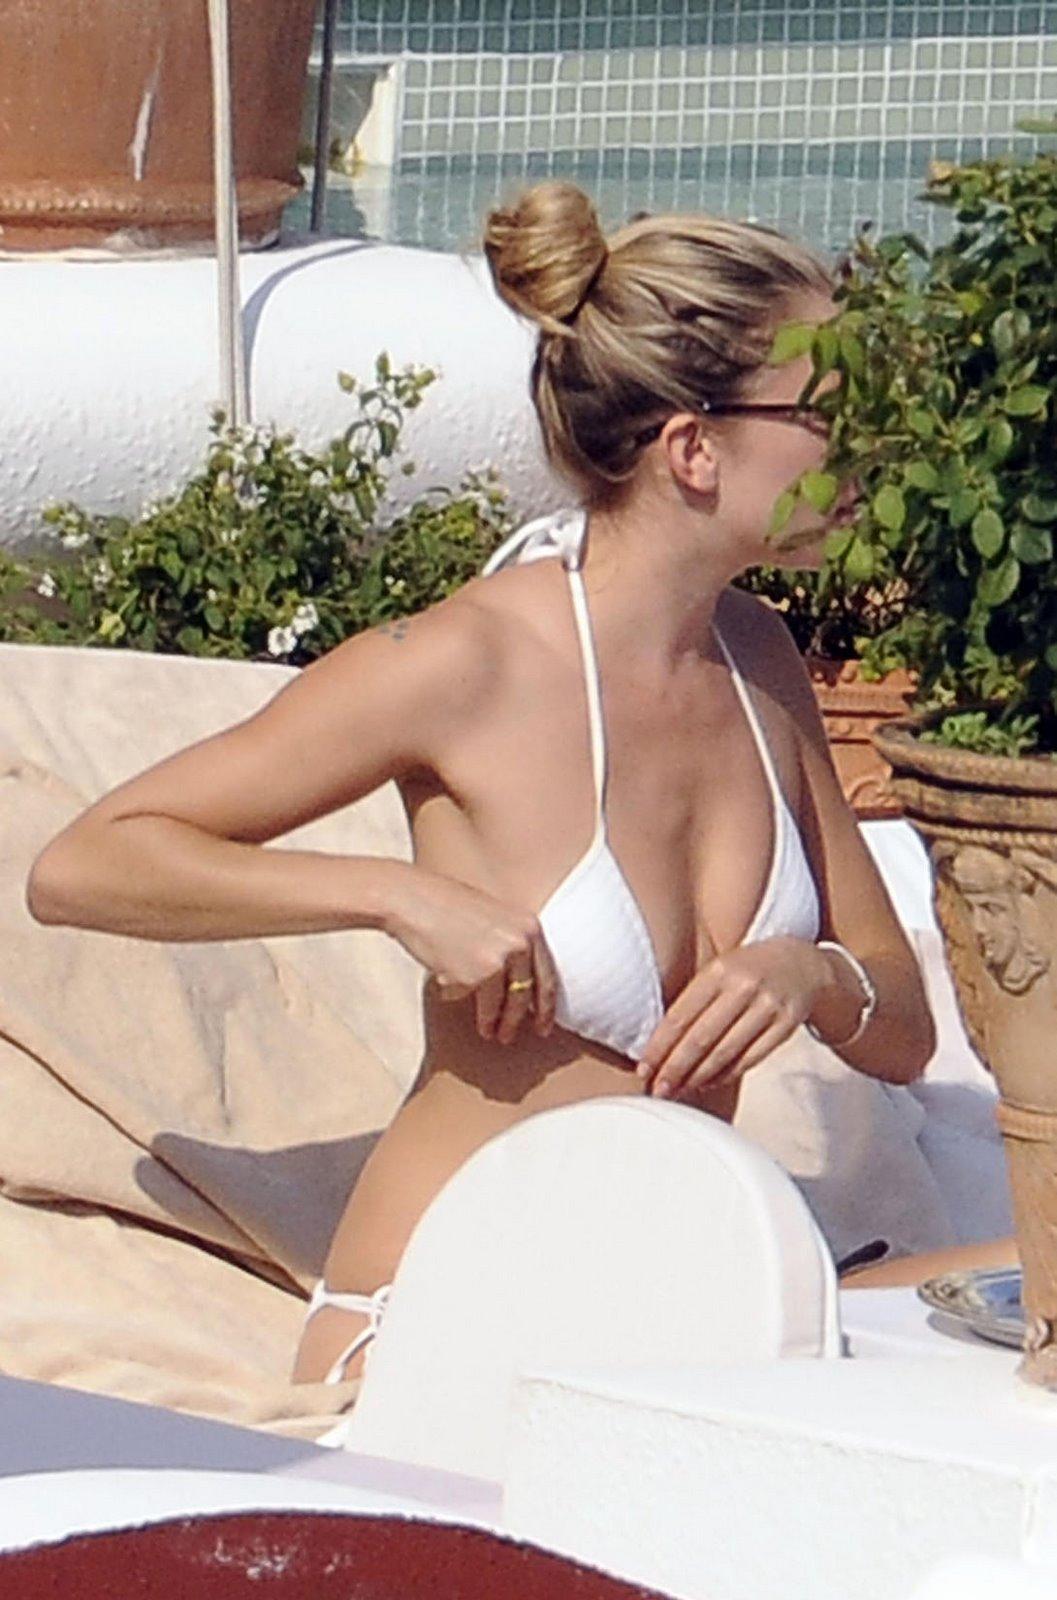 Sienna Miller Micro Bikini Pictures 2 Bikini Contest! 768x1024   83.83K   jpeg ryan white.net [ View full size ]